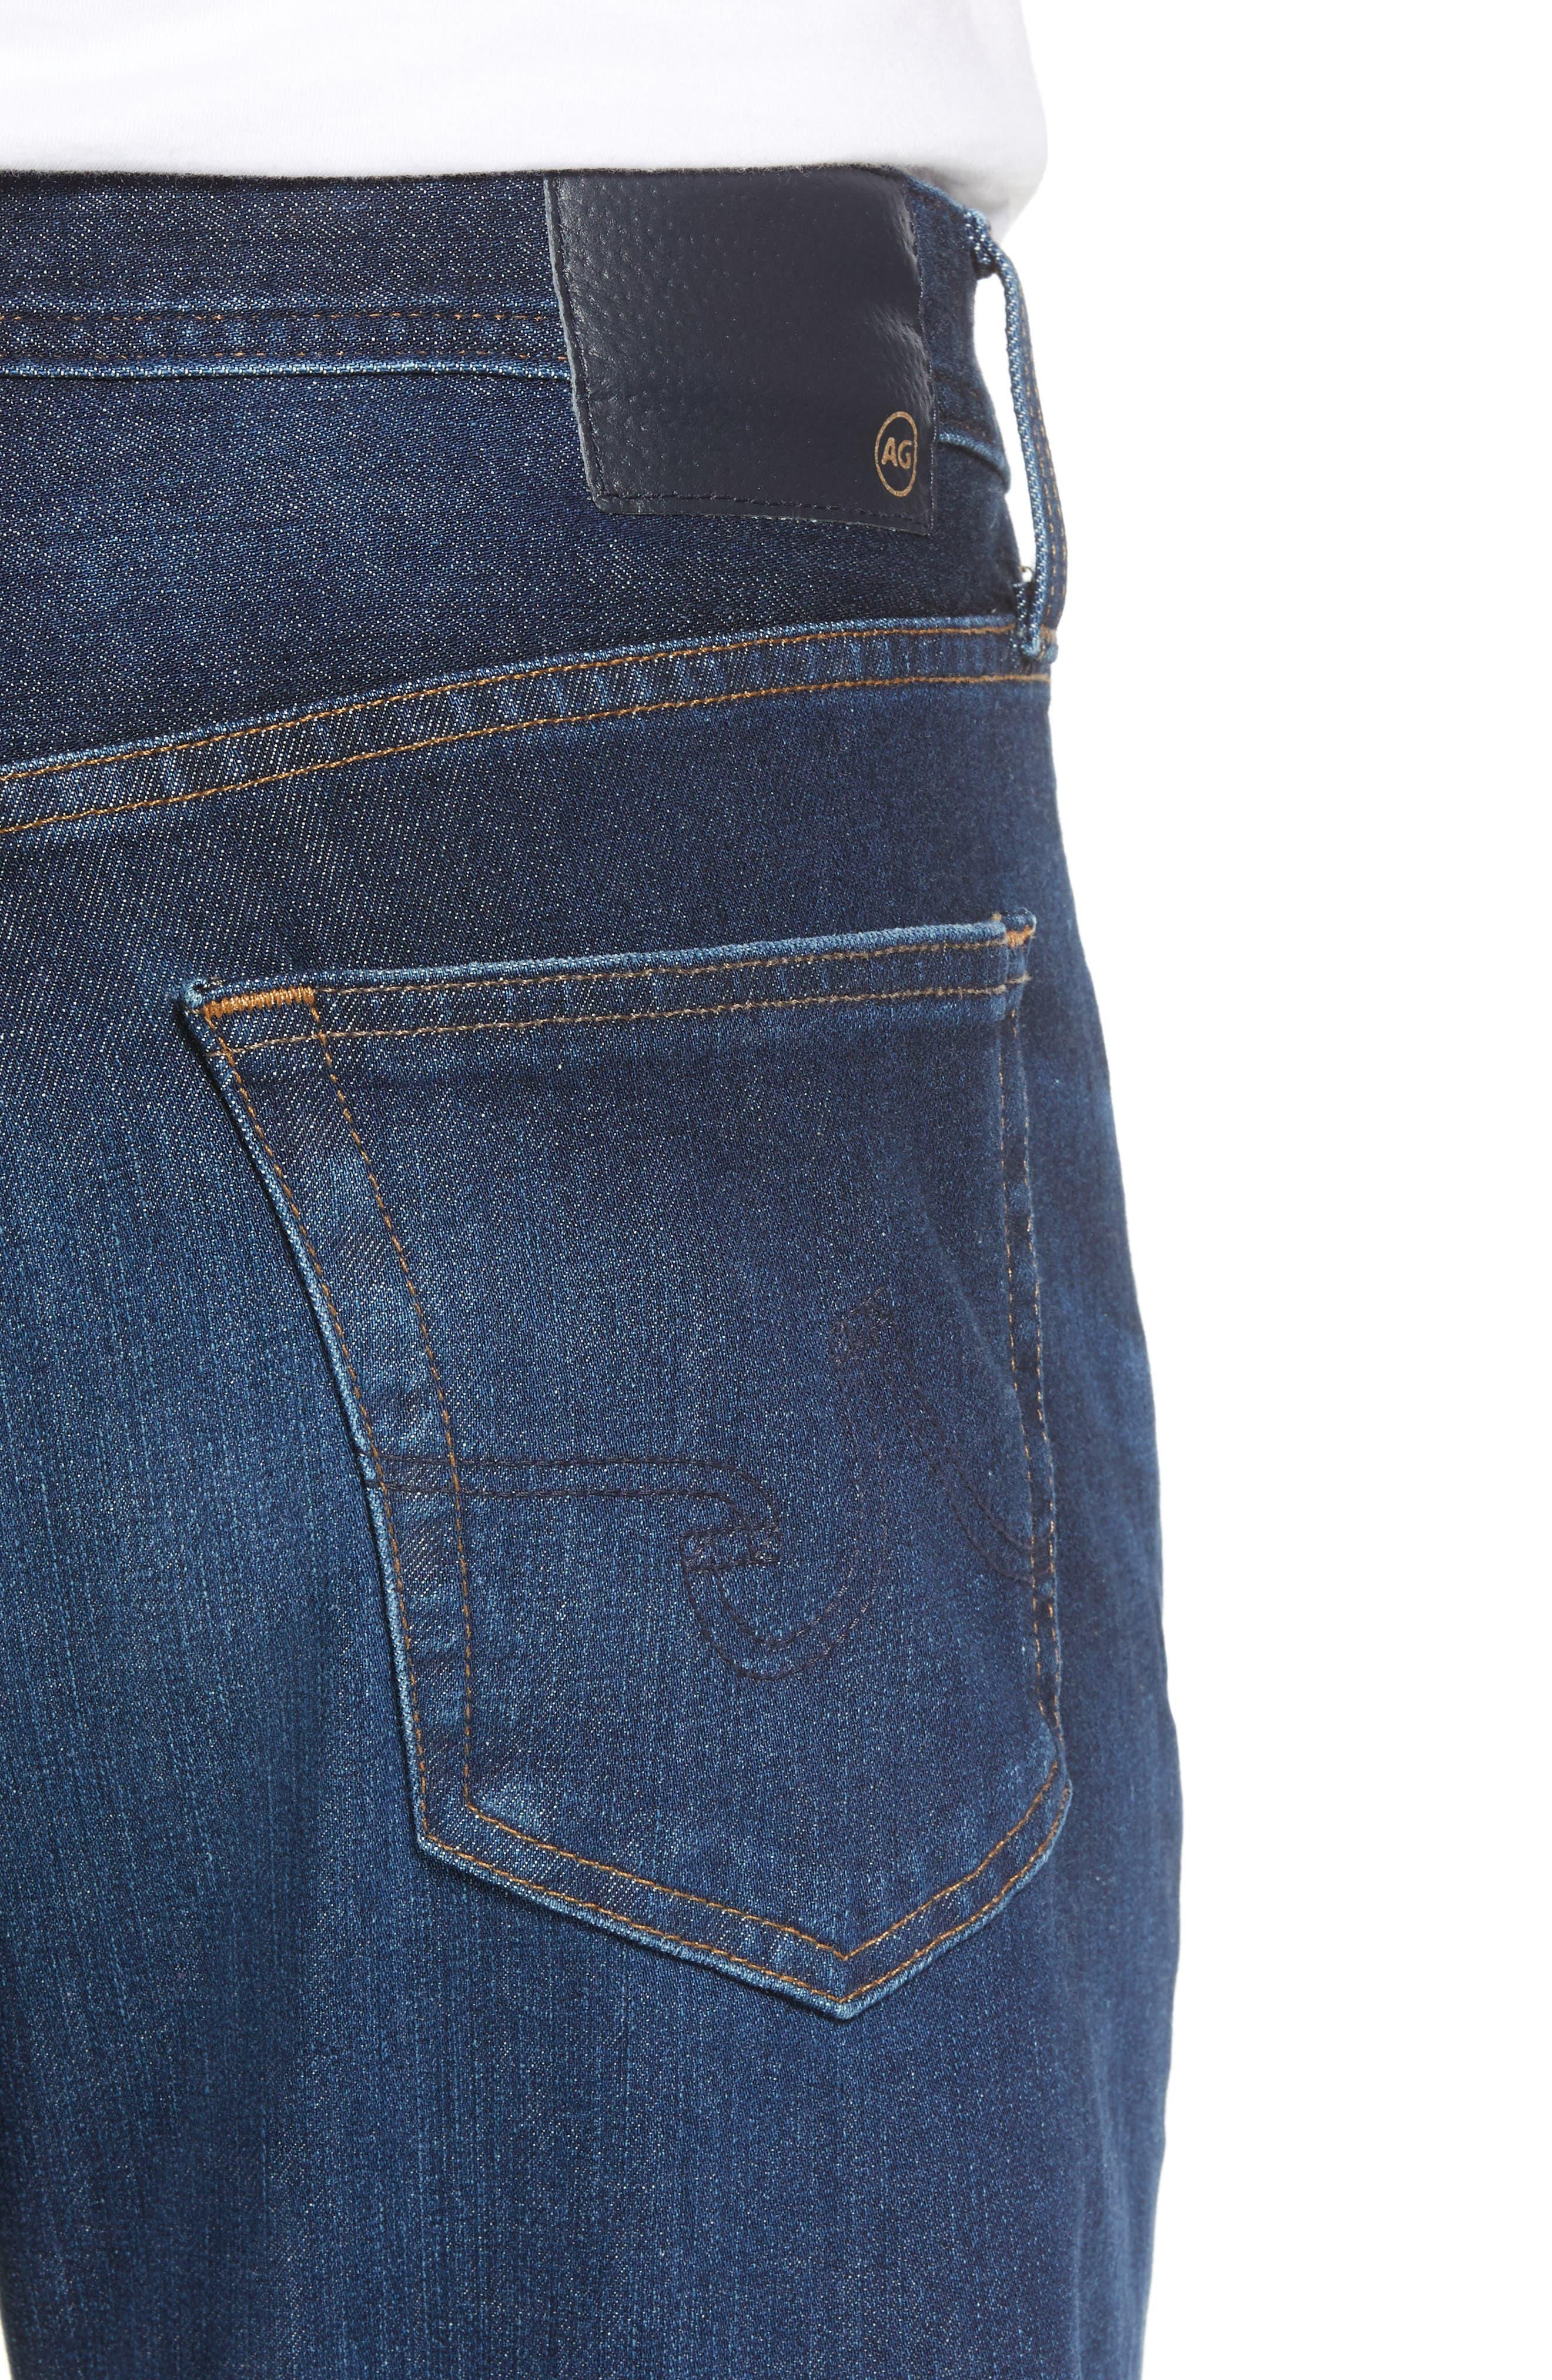 Graduate Slim Straight Fit Jeans,                             Alternate thumbnail 4, color,                             5 Years Lost Coast